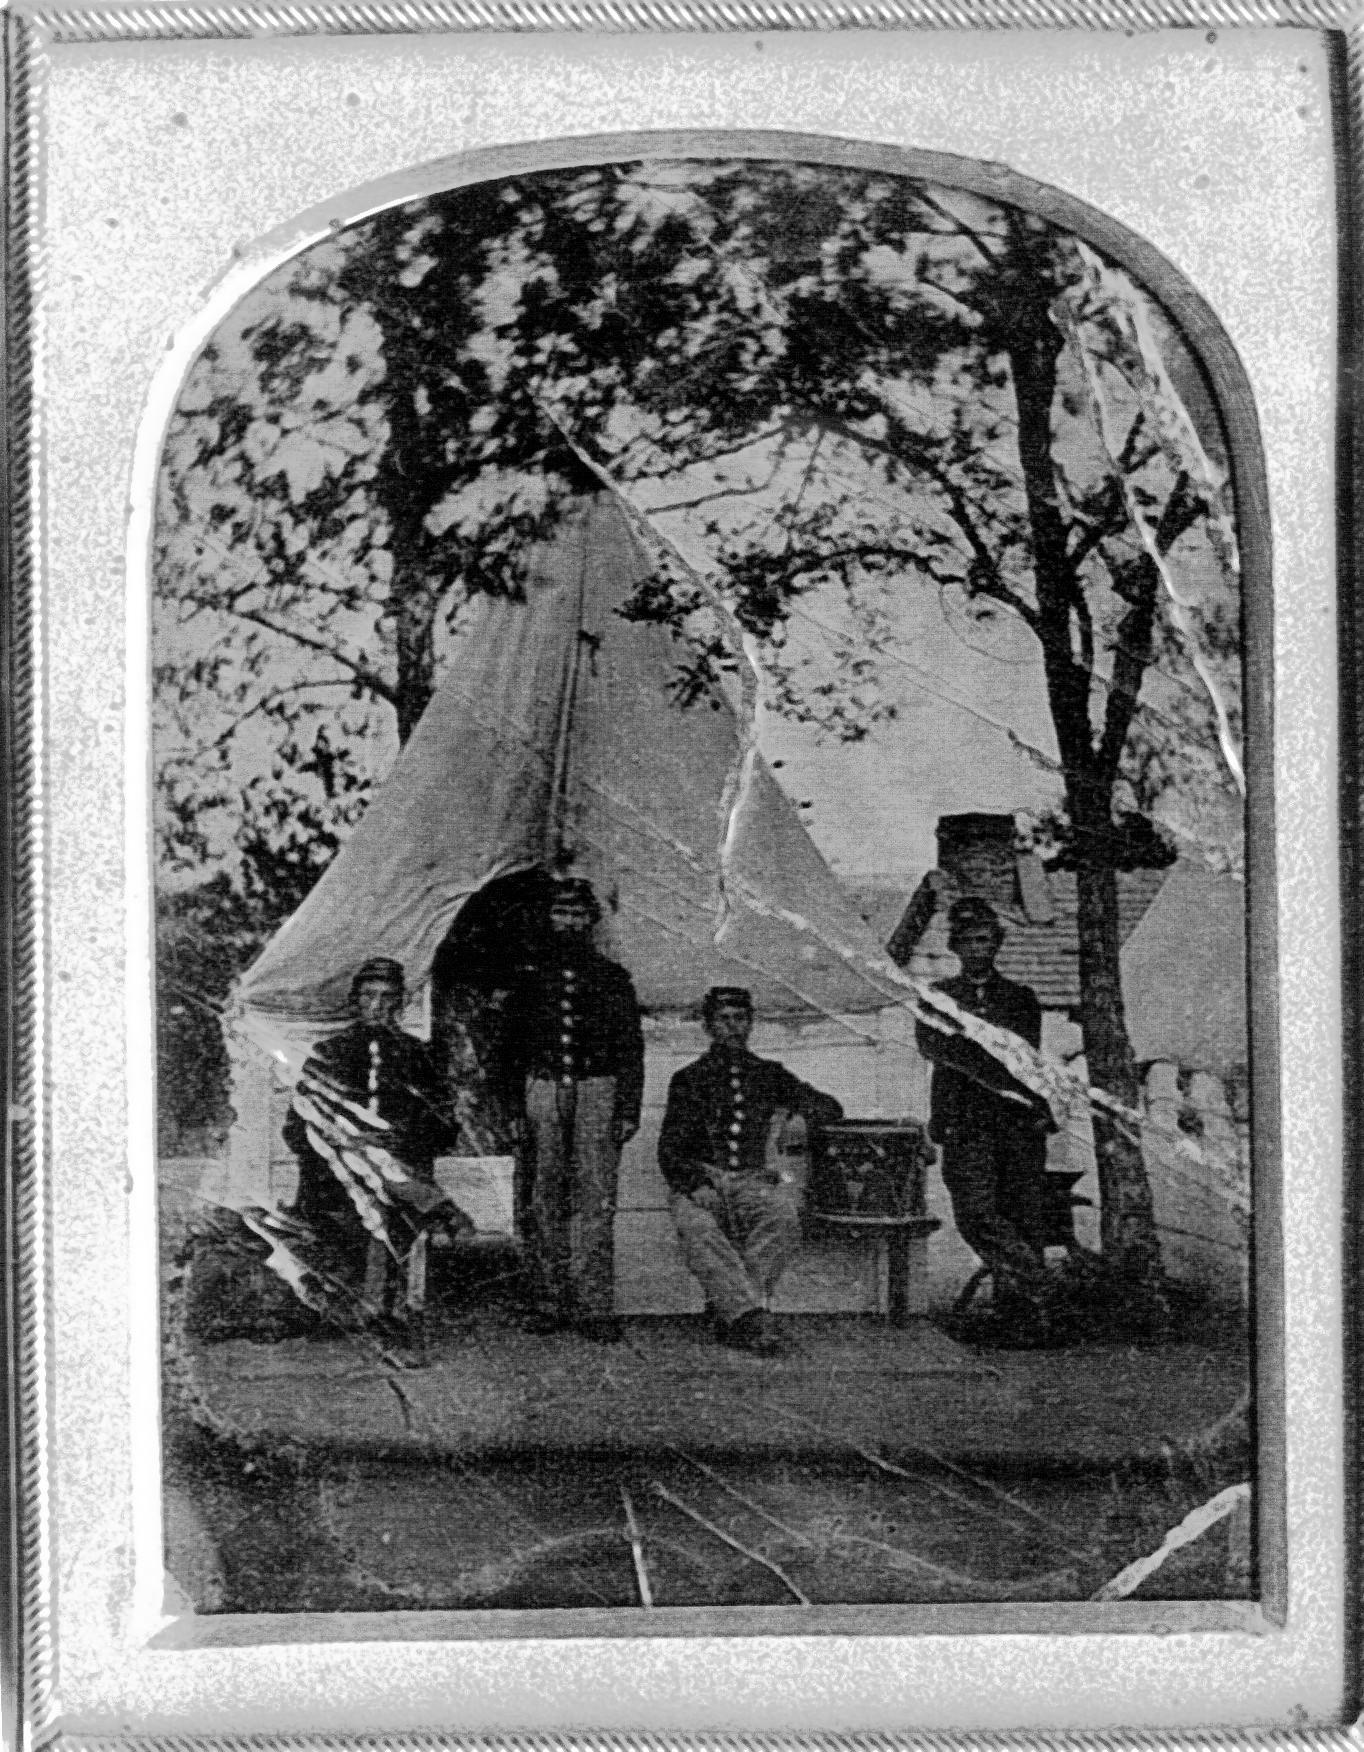 George B. Wiltsie, 4th NY Heavy Artillery